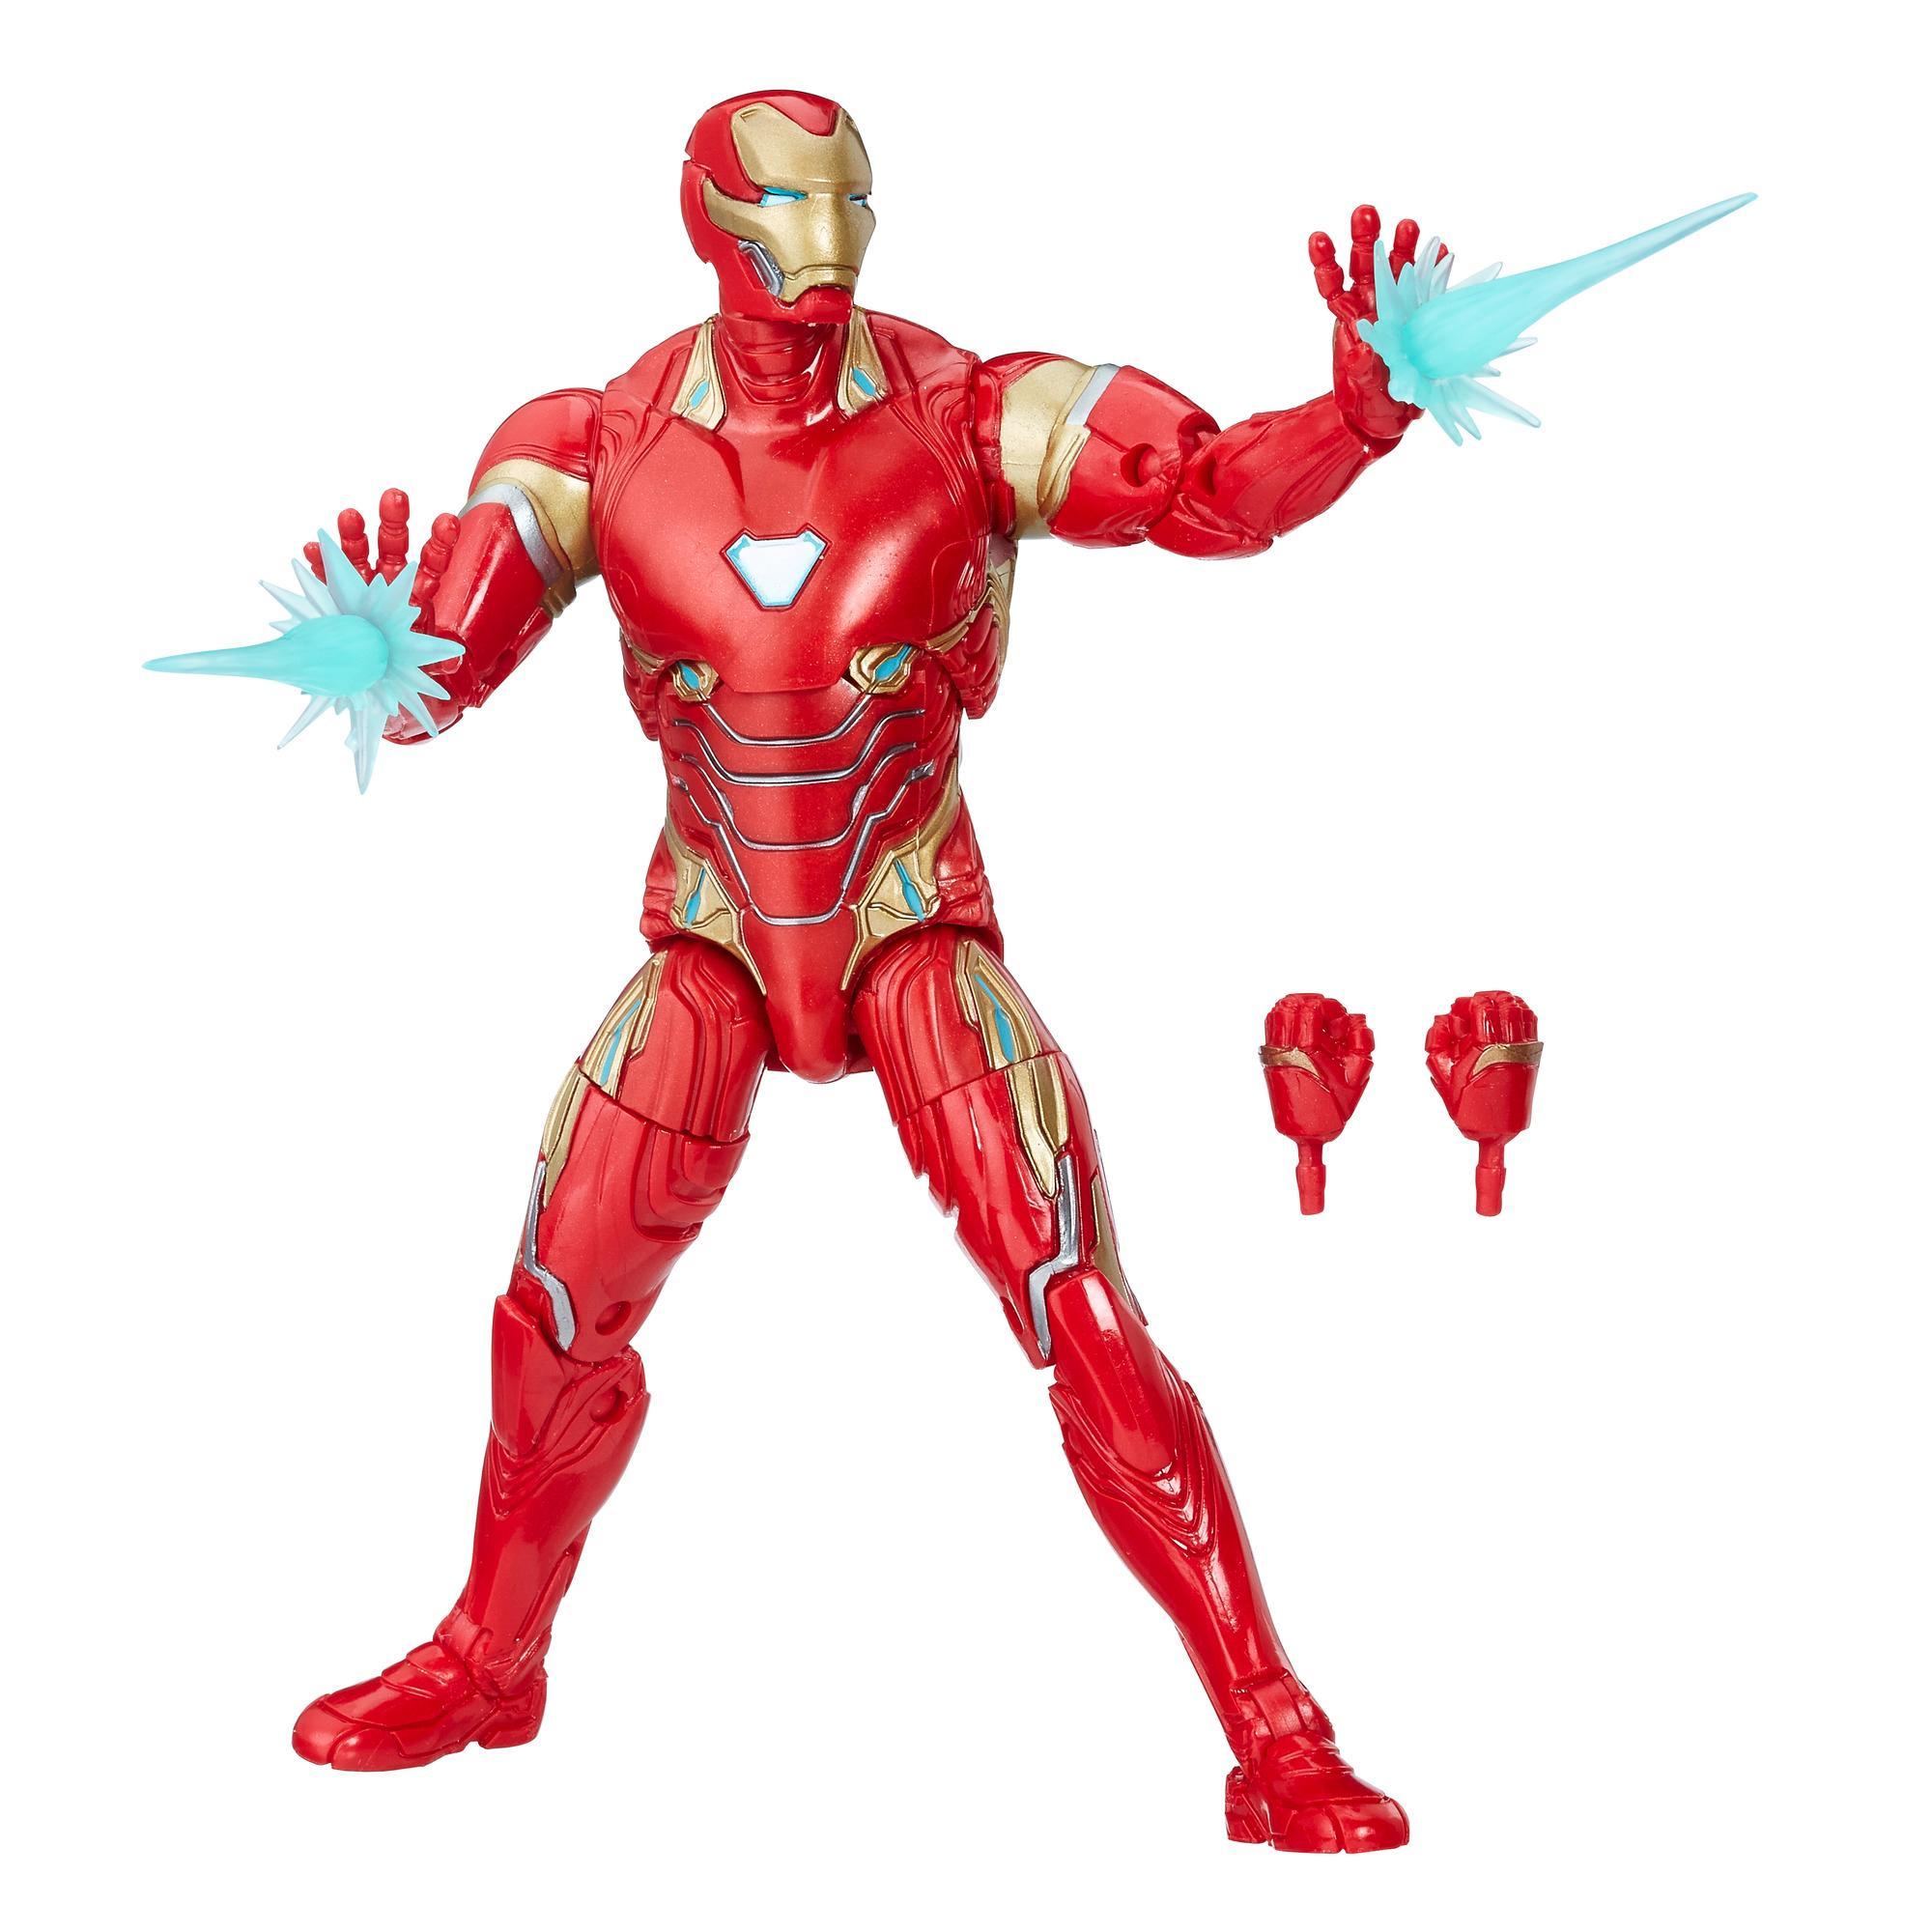 Avengers Marvel Legends Series - Iron Man de 15 cm